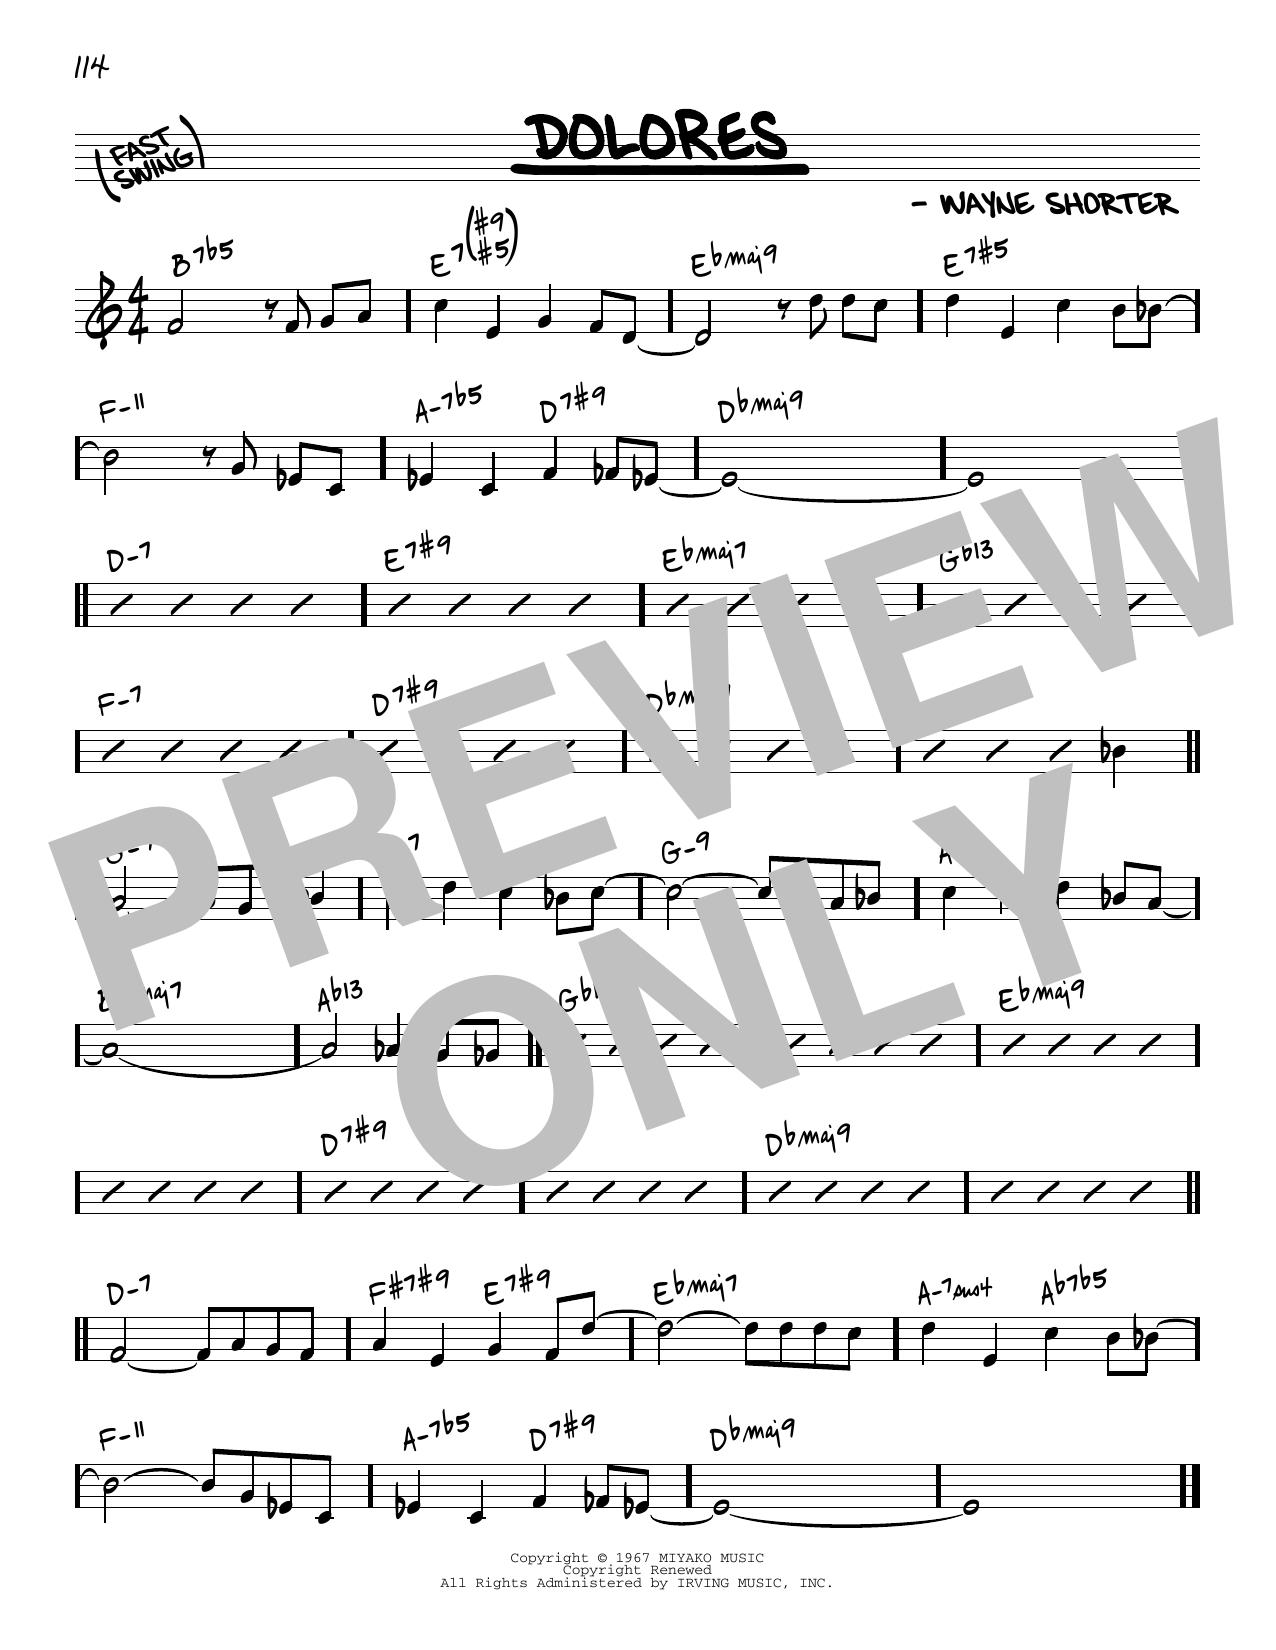 Wayne Shorter Dolores [Reharmonized version] (arr. Jack Grassel) sheet music notes printable PDF score